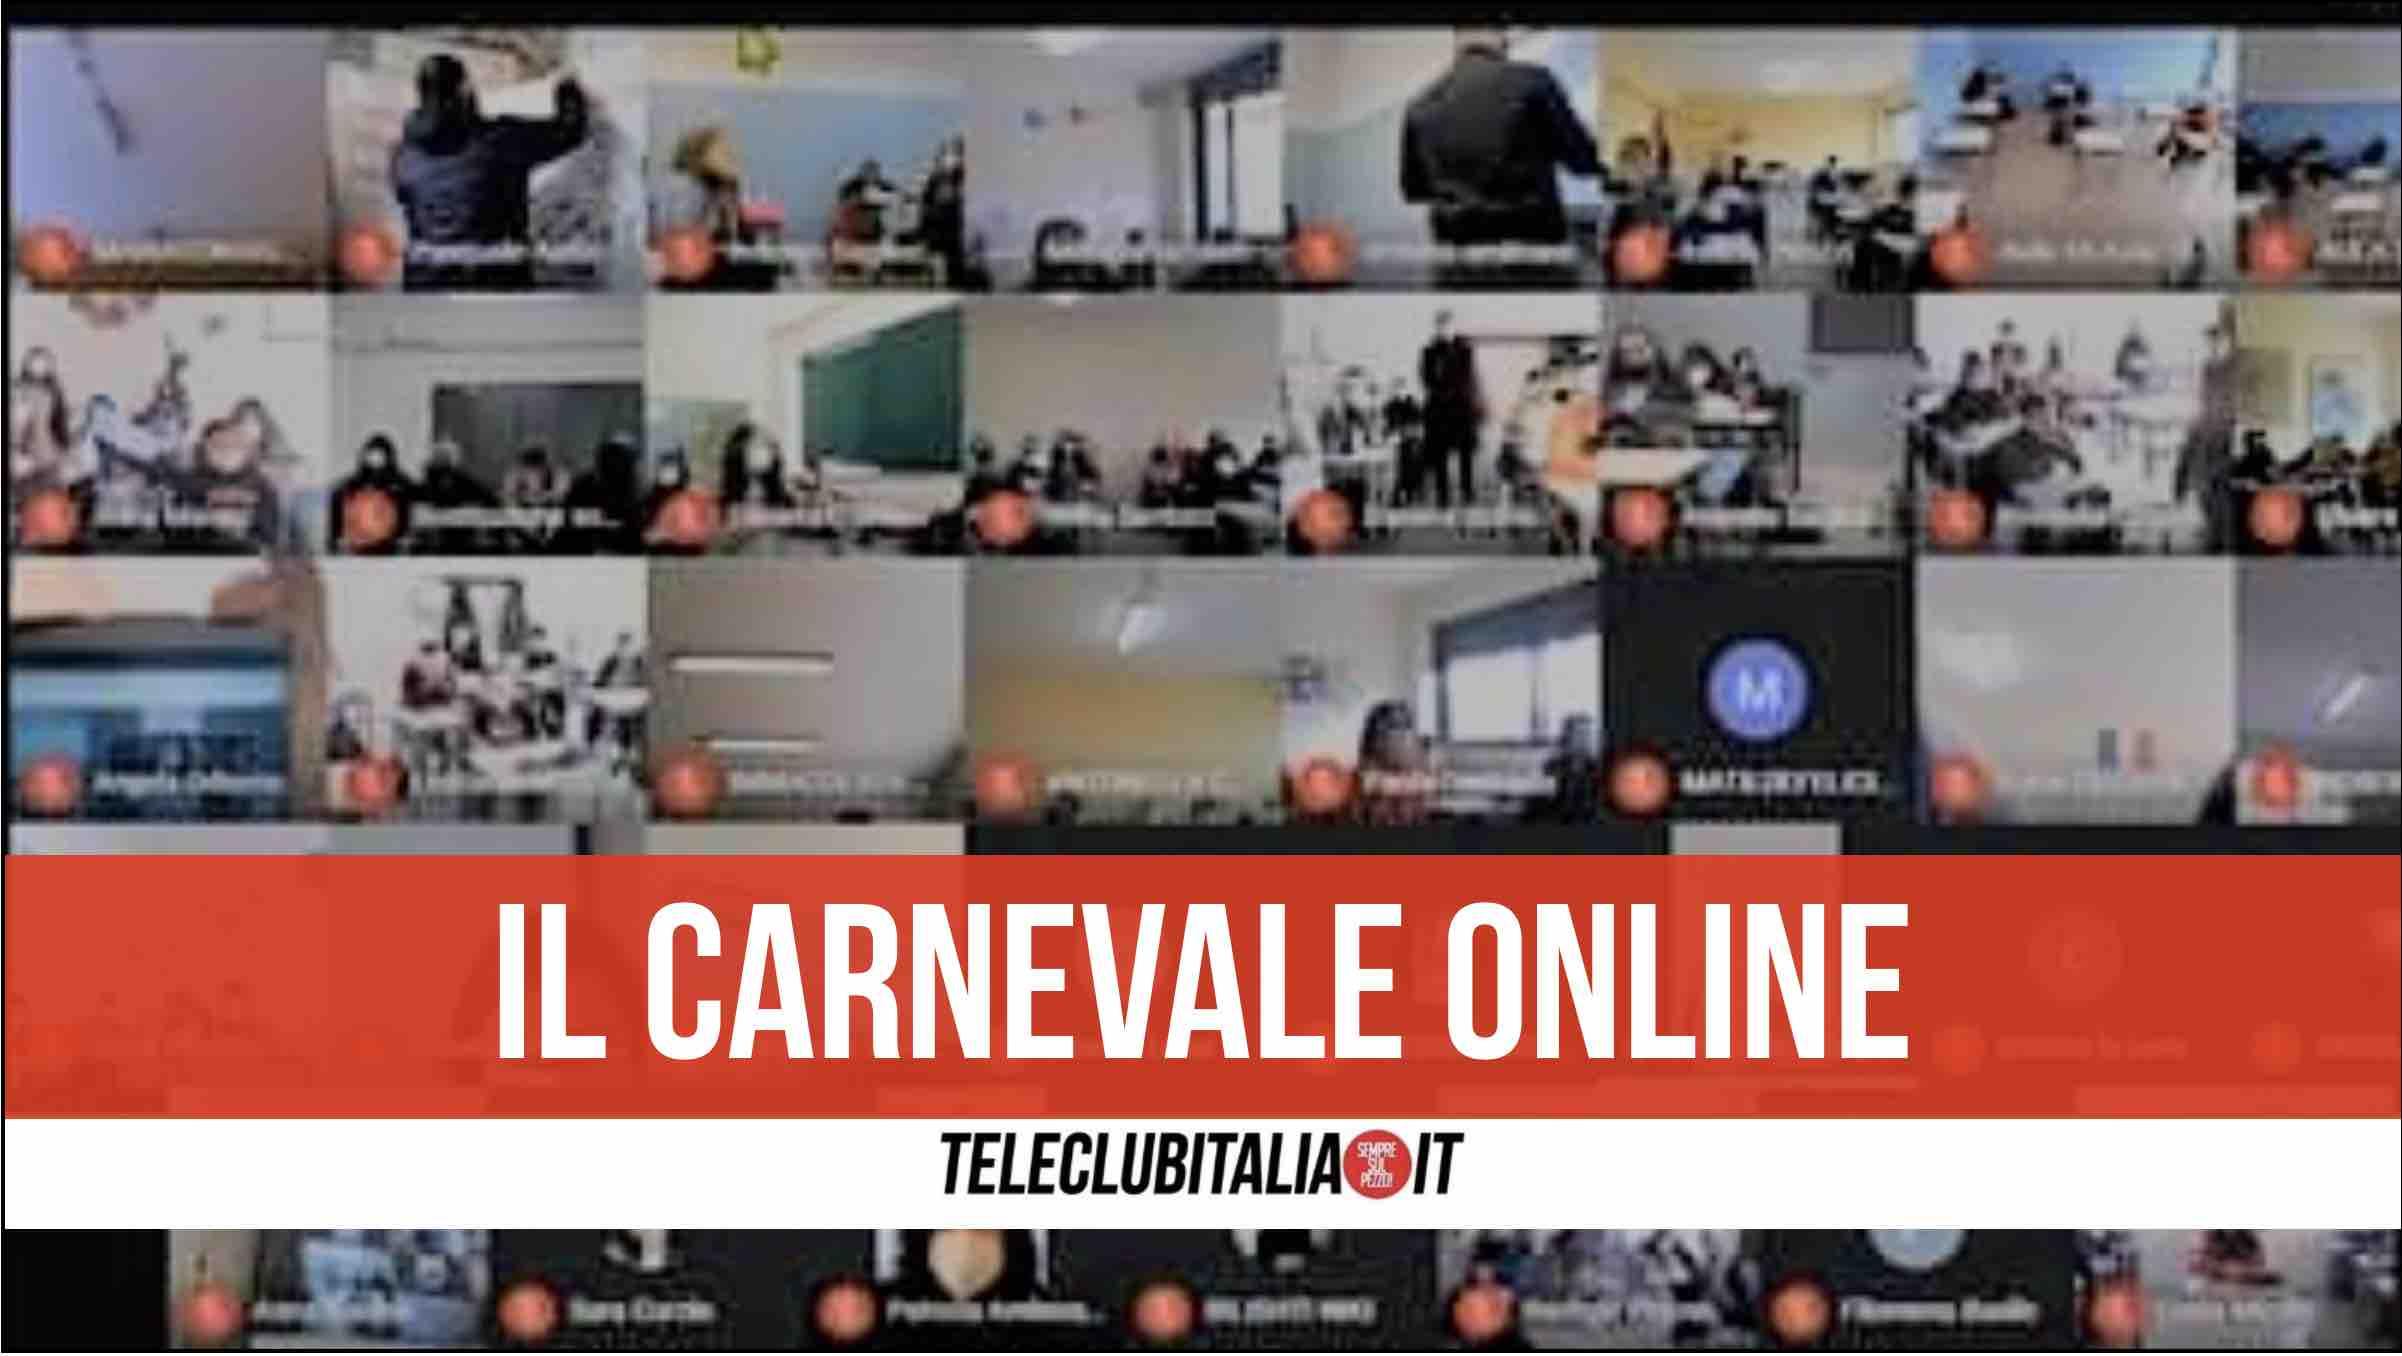 set me free giugliano carnevale